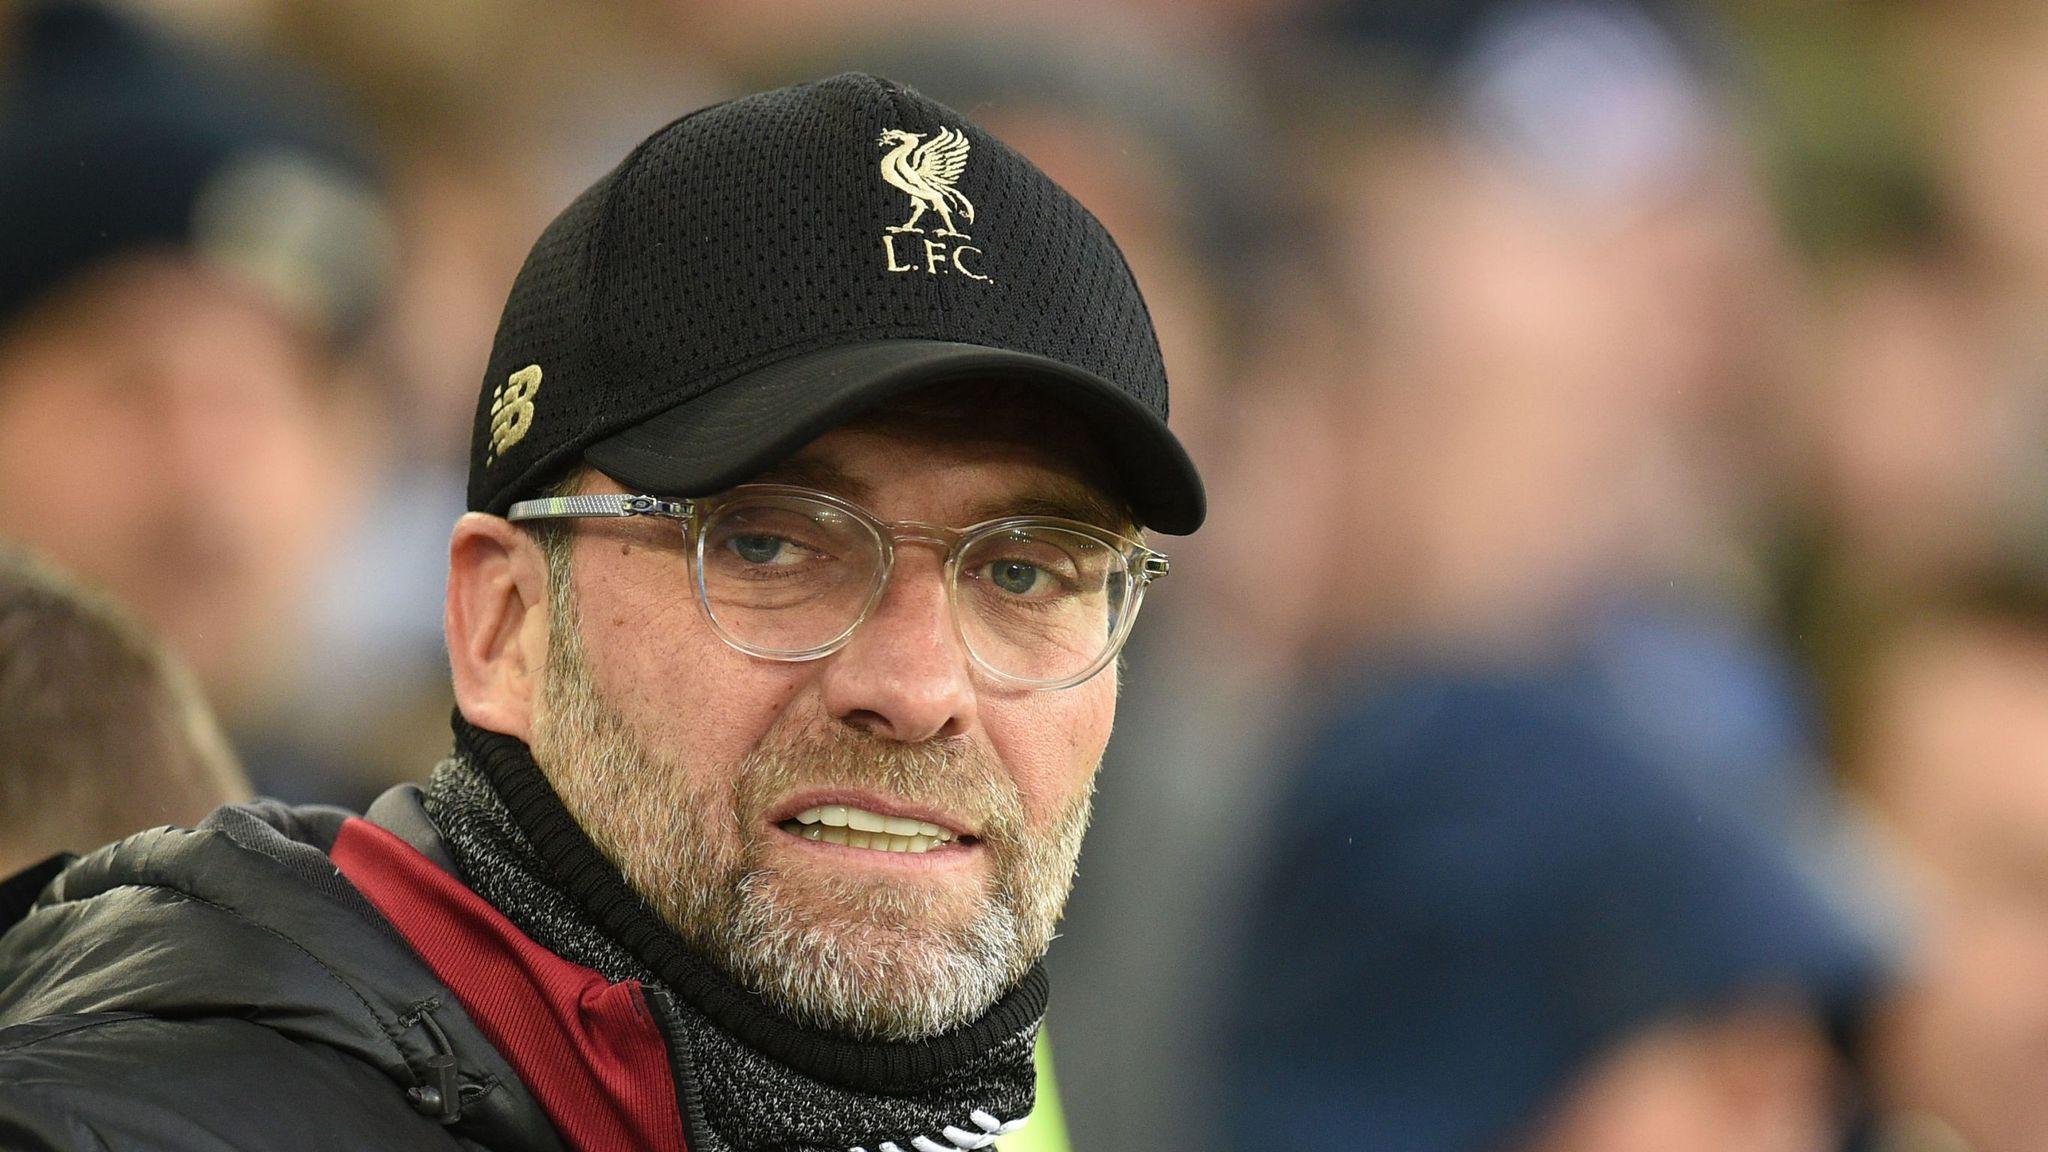 Jurgen Klopp panicking as Liverpool stutter in Premier